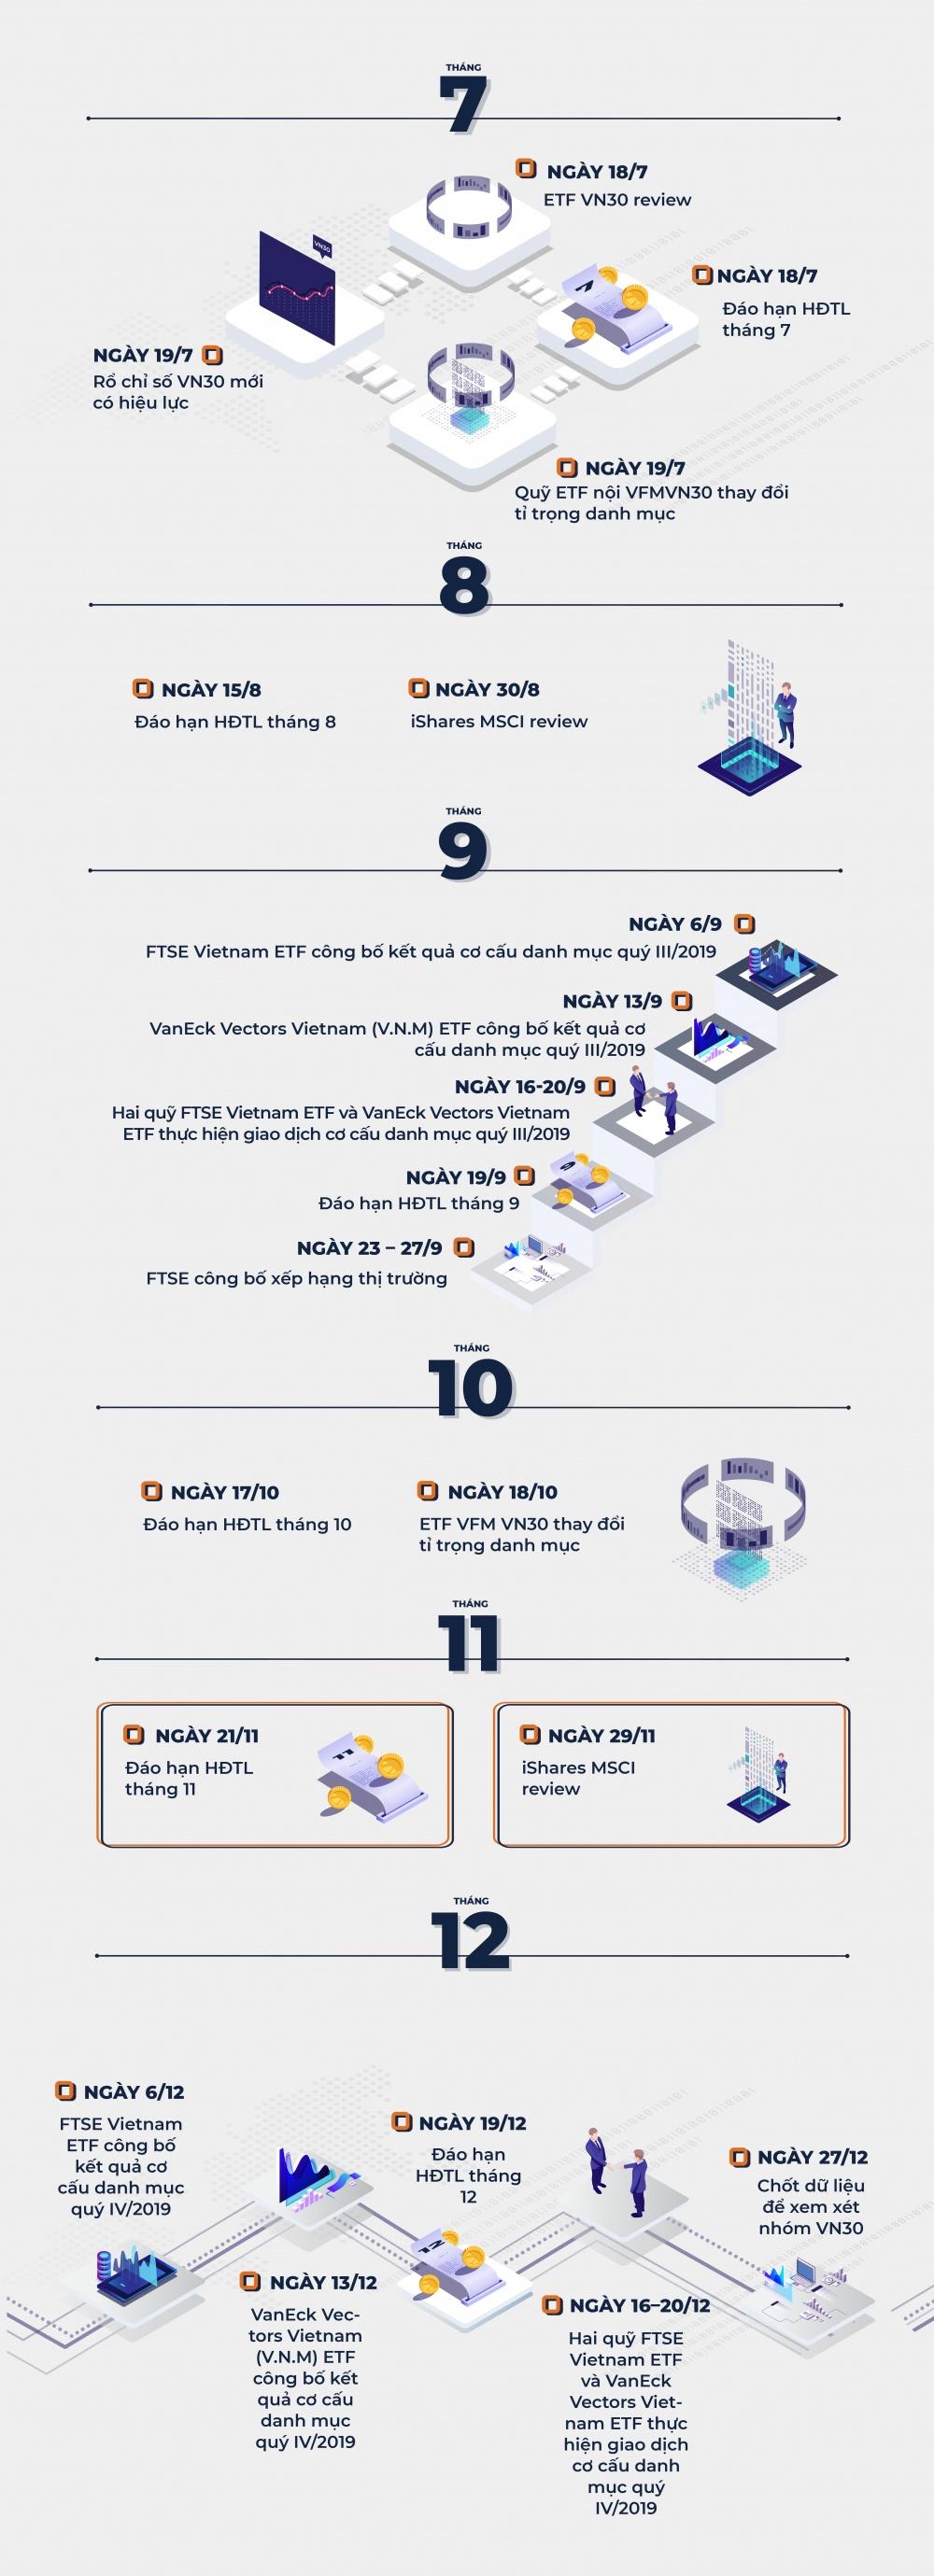 infographic nhung moc su kien nha dau tu chung khoan can quan tam trong nam 2019